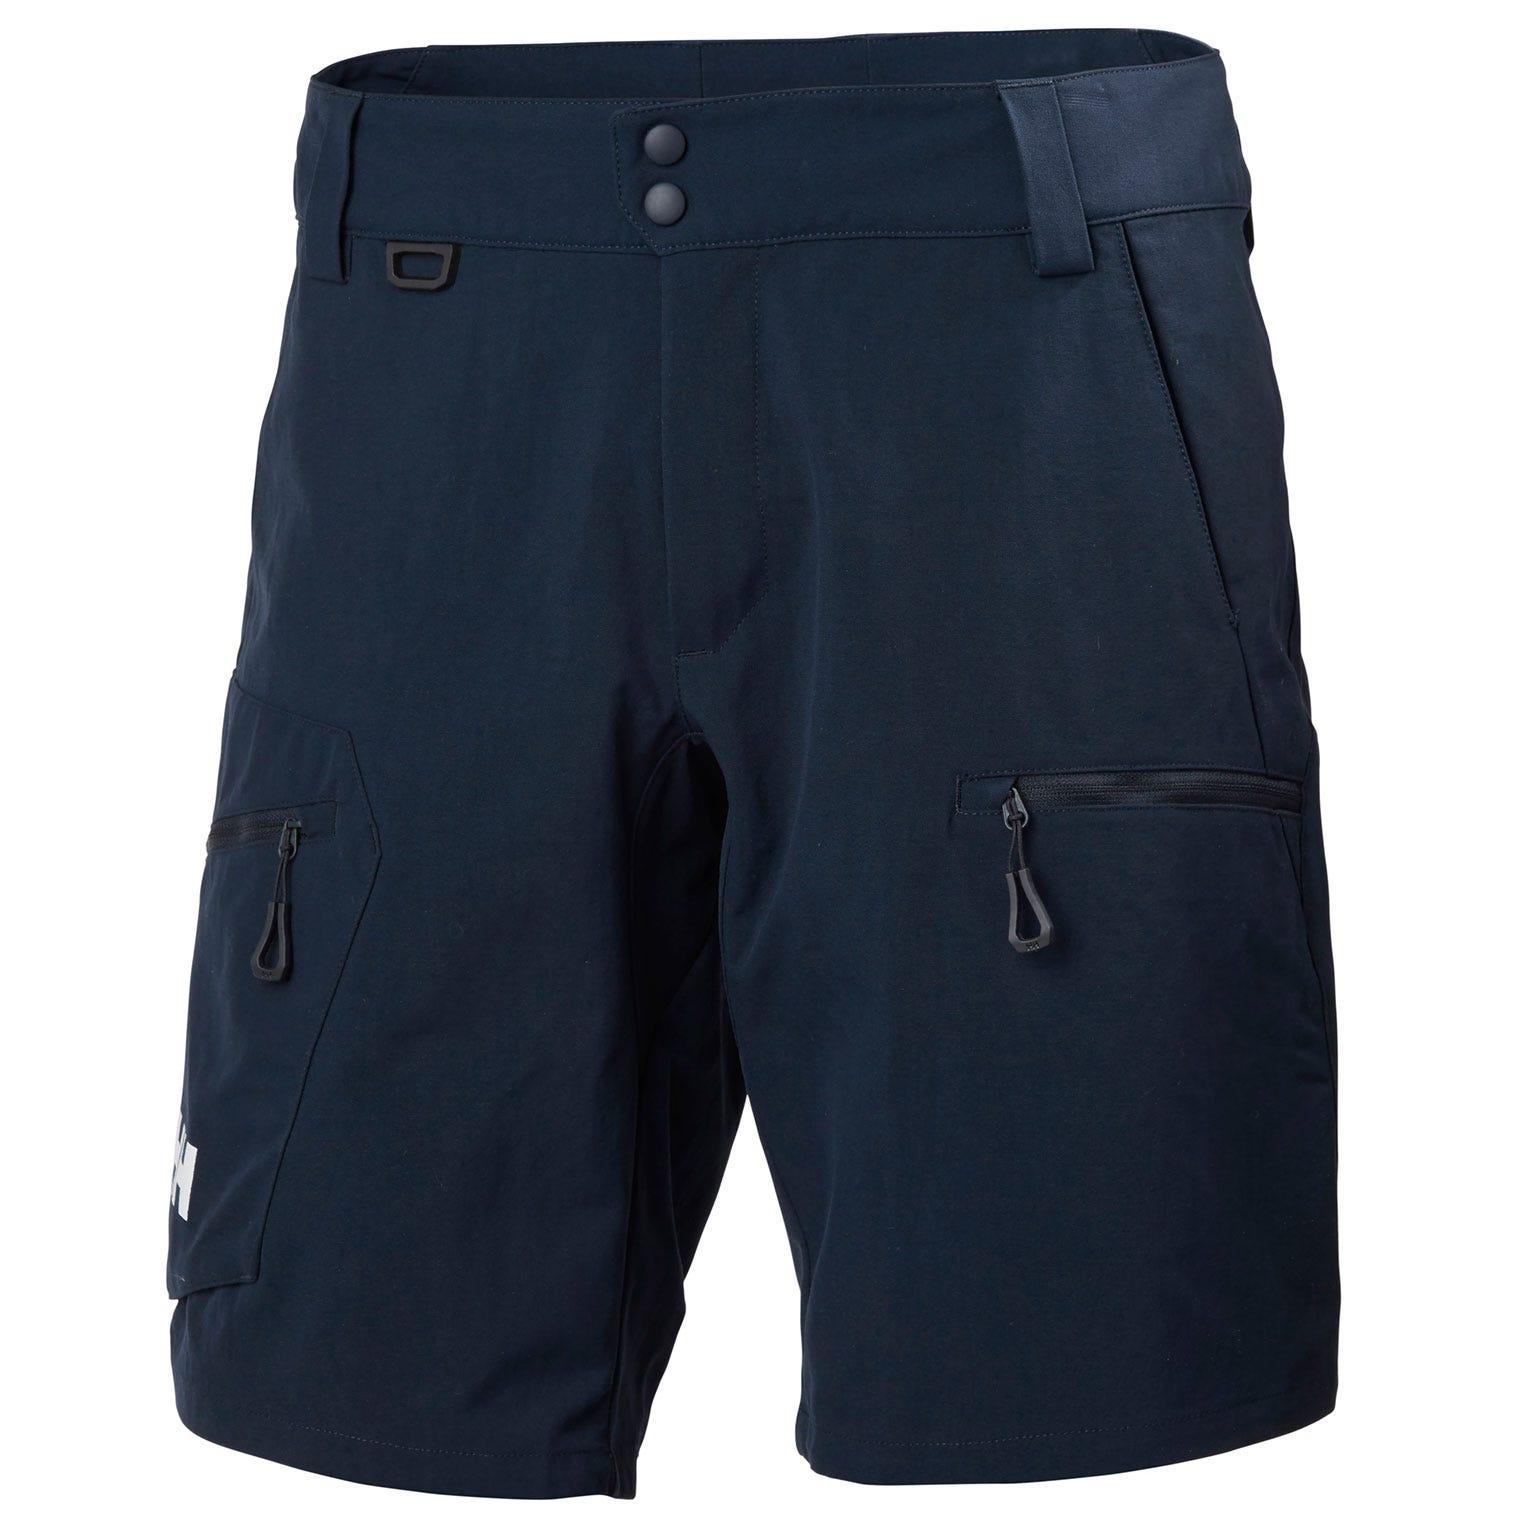 Helly Hansen Crewline Cargo Shorts Mens Sailing Pant Navy 28